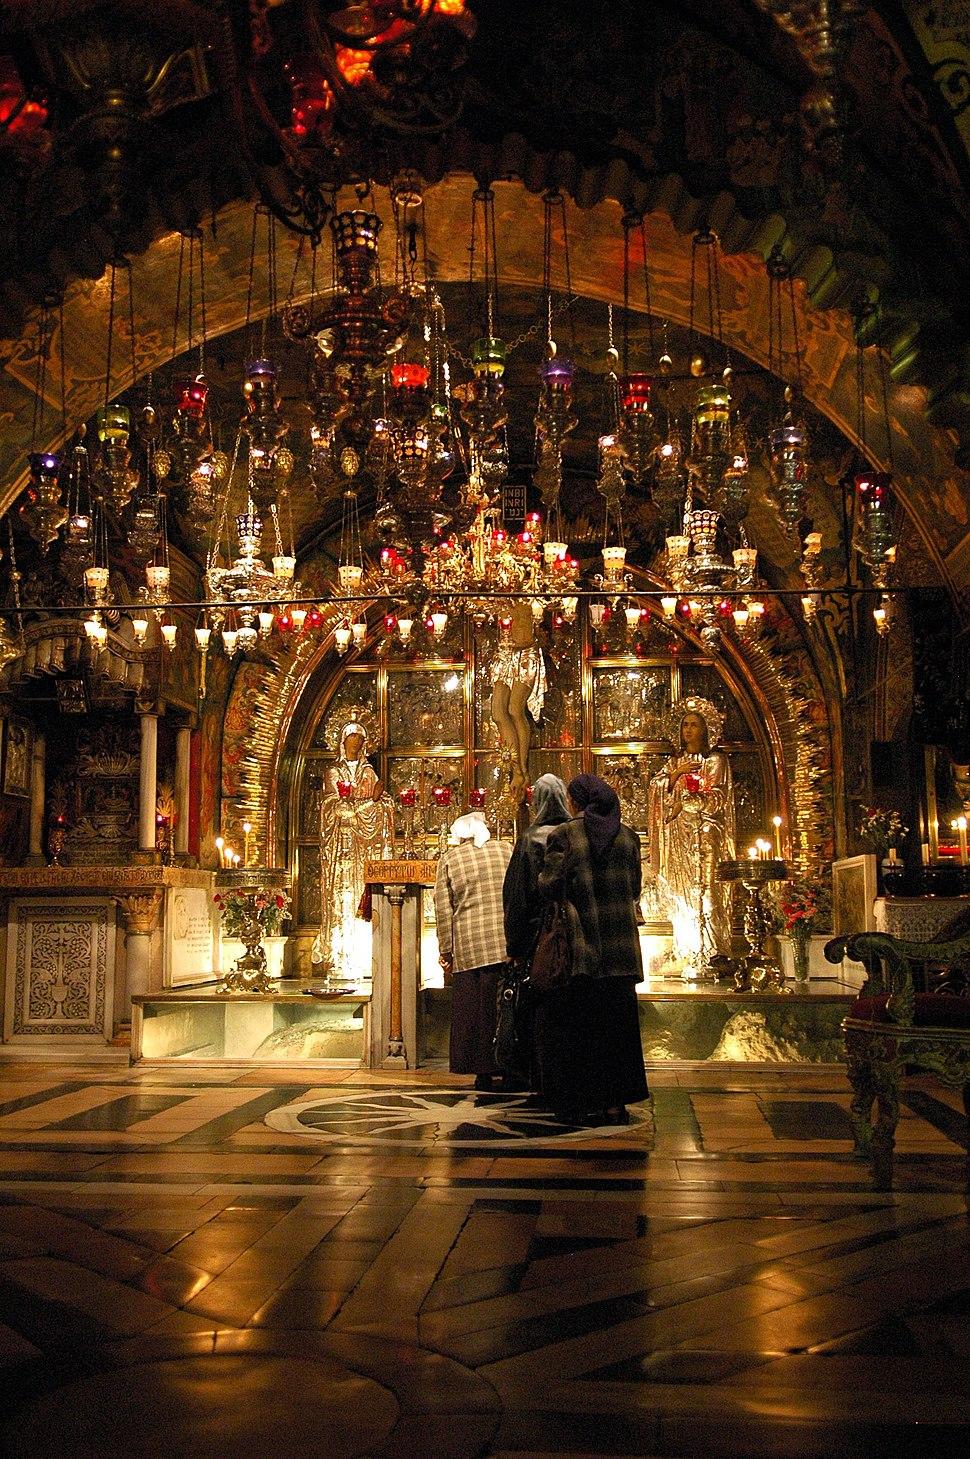 Golgotha (Church of the Holy Sepulchre)